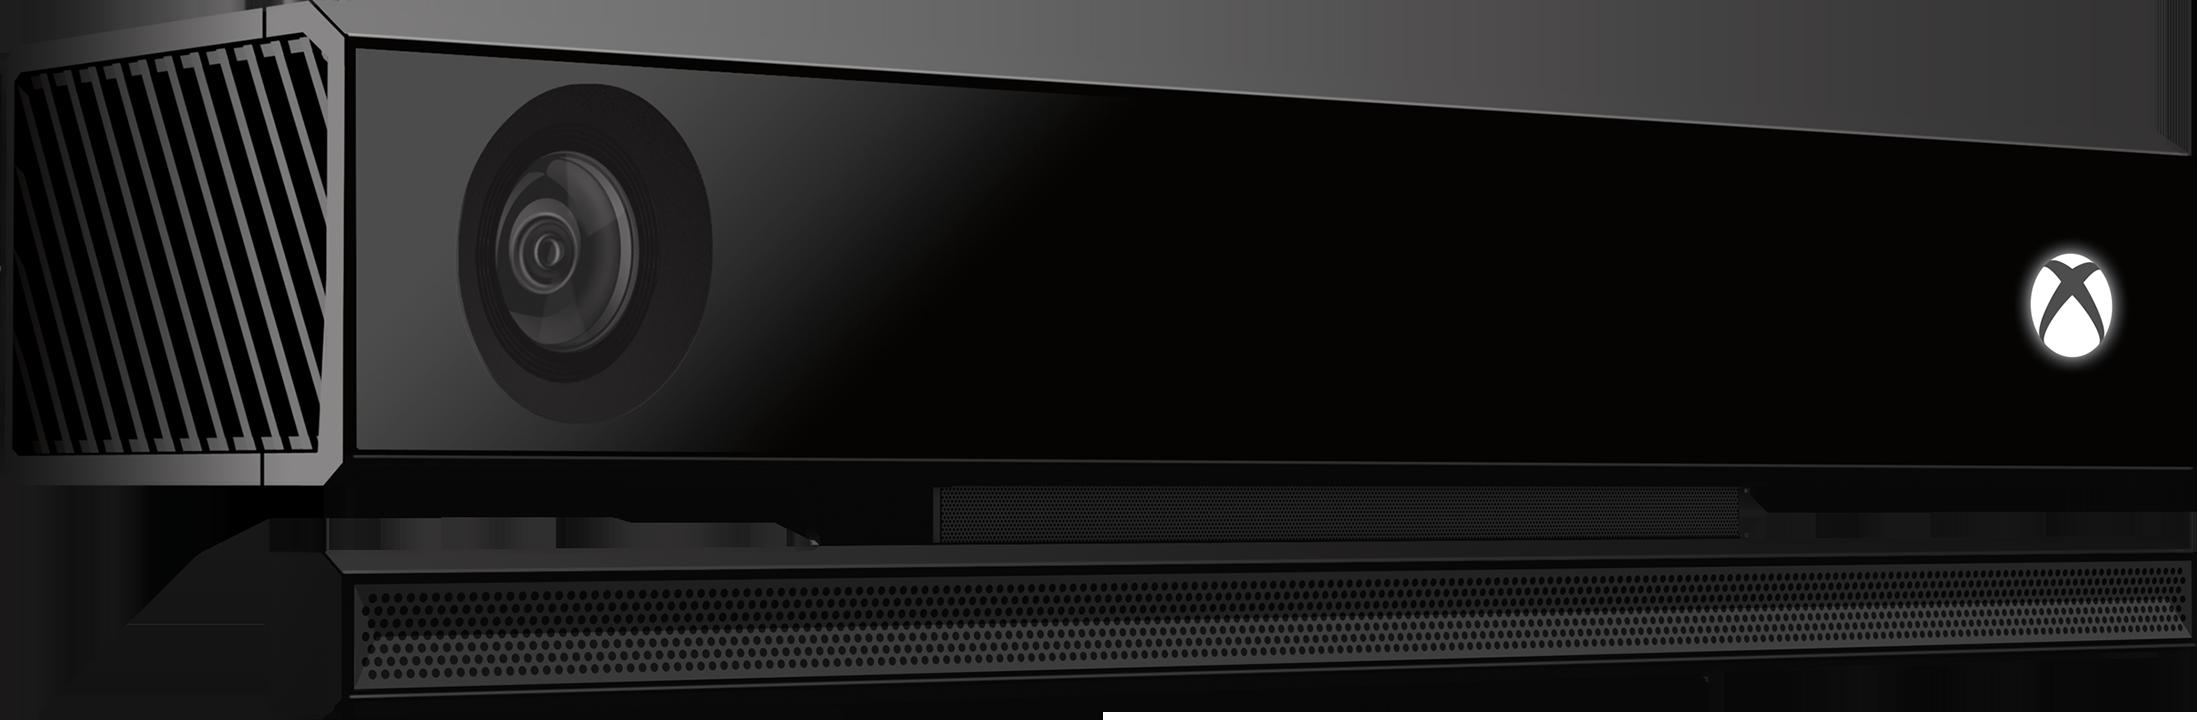 Refurbished Kinect Sensor for Xbox One